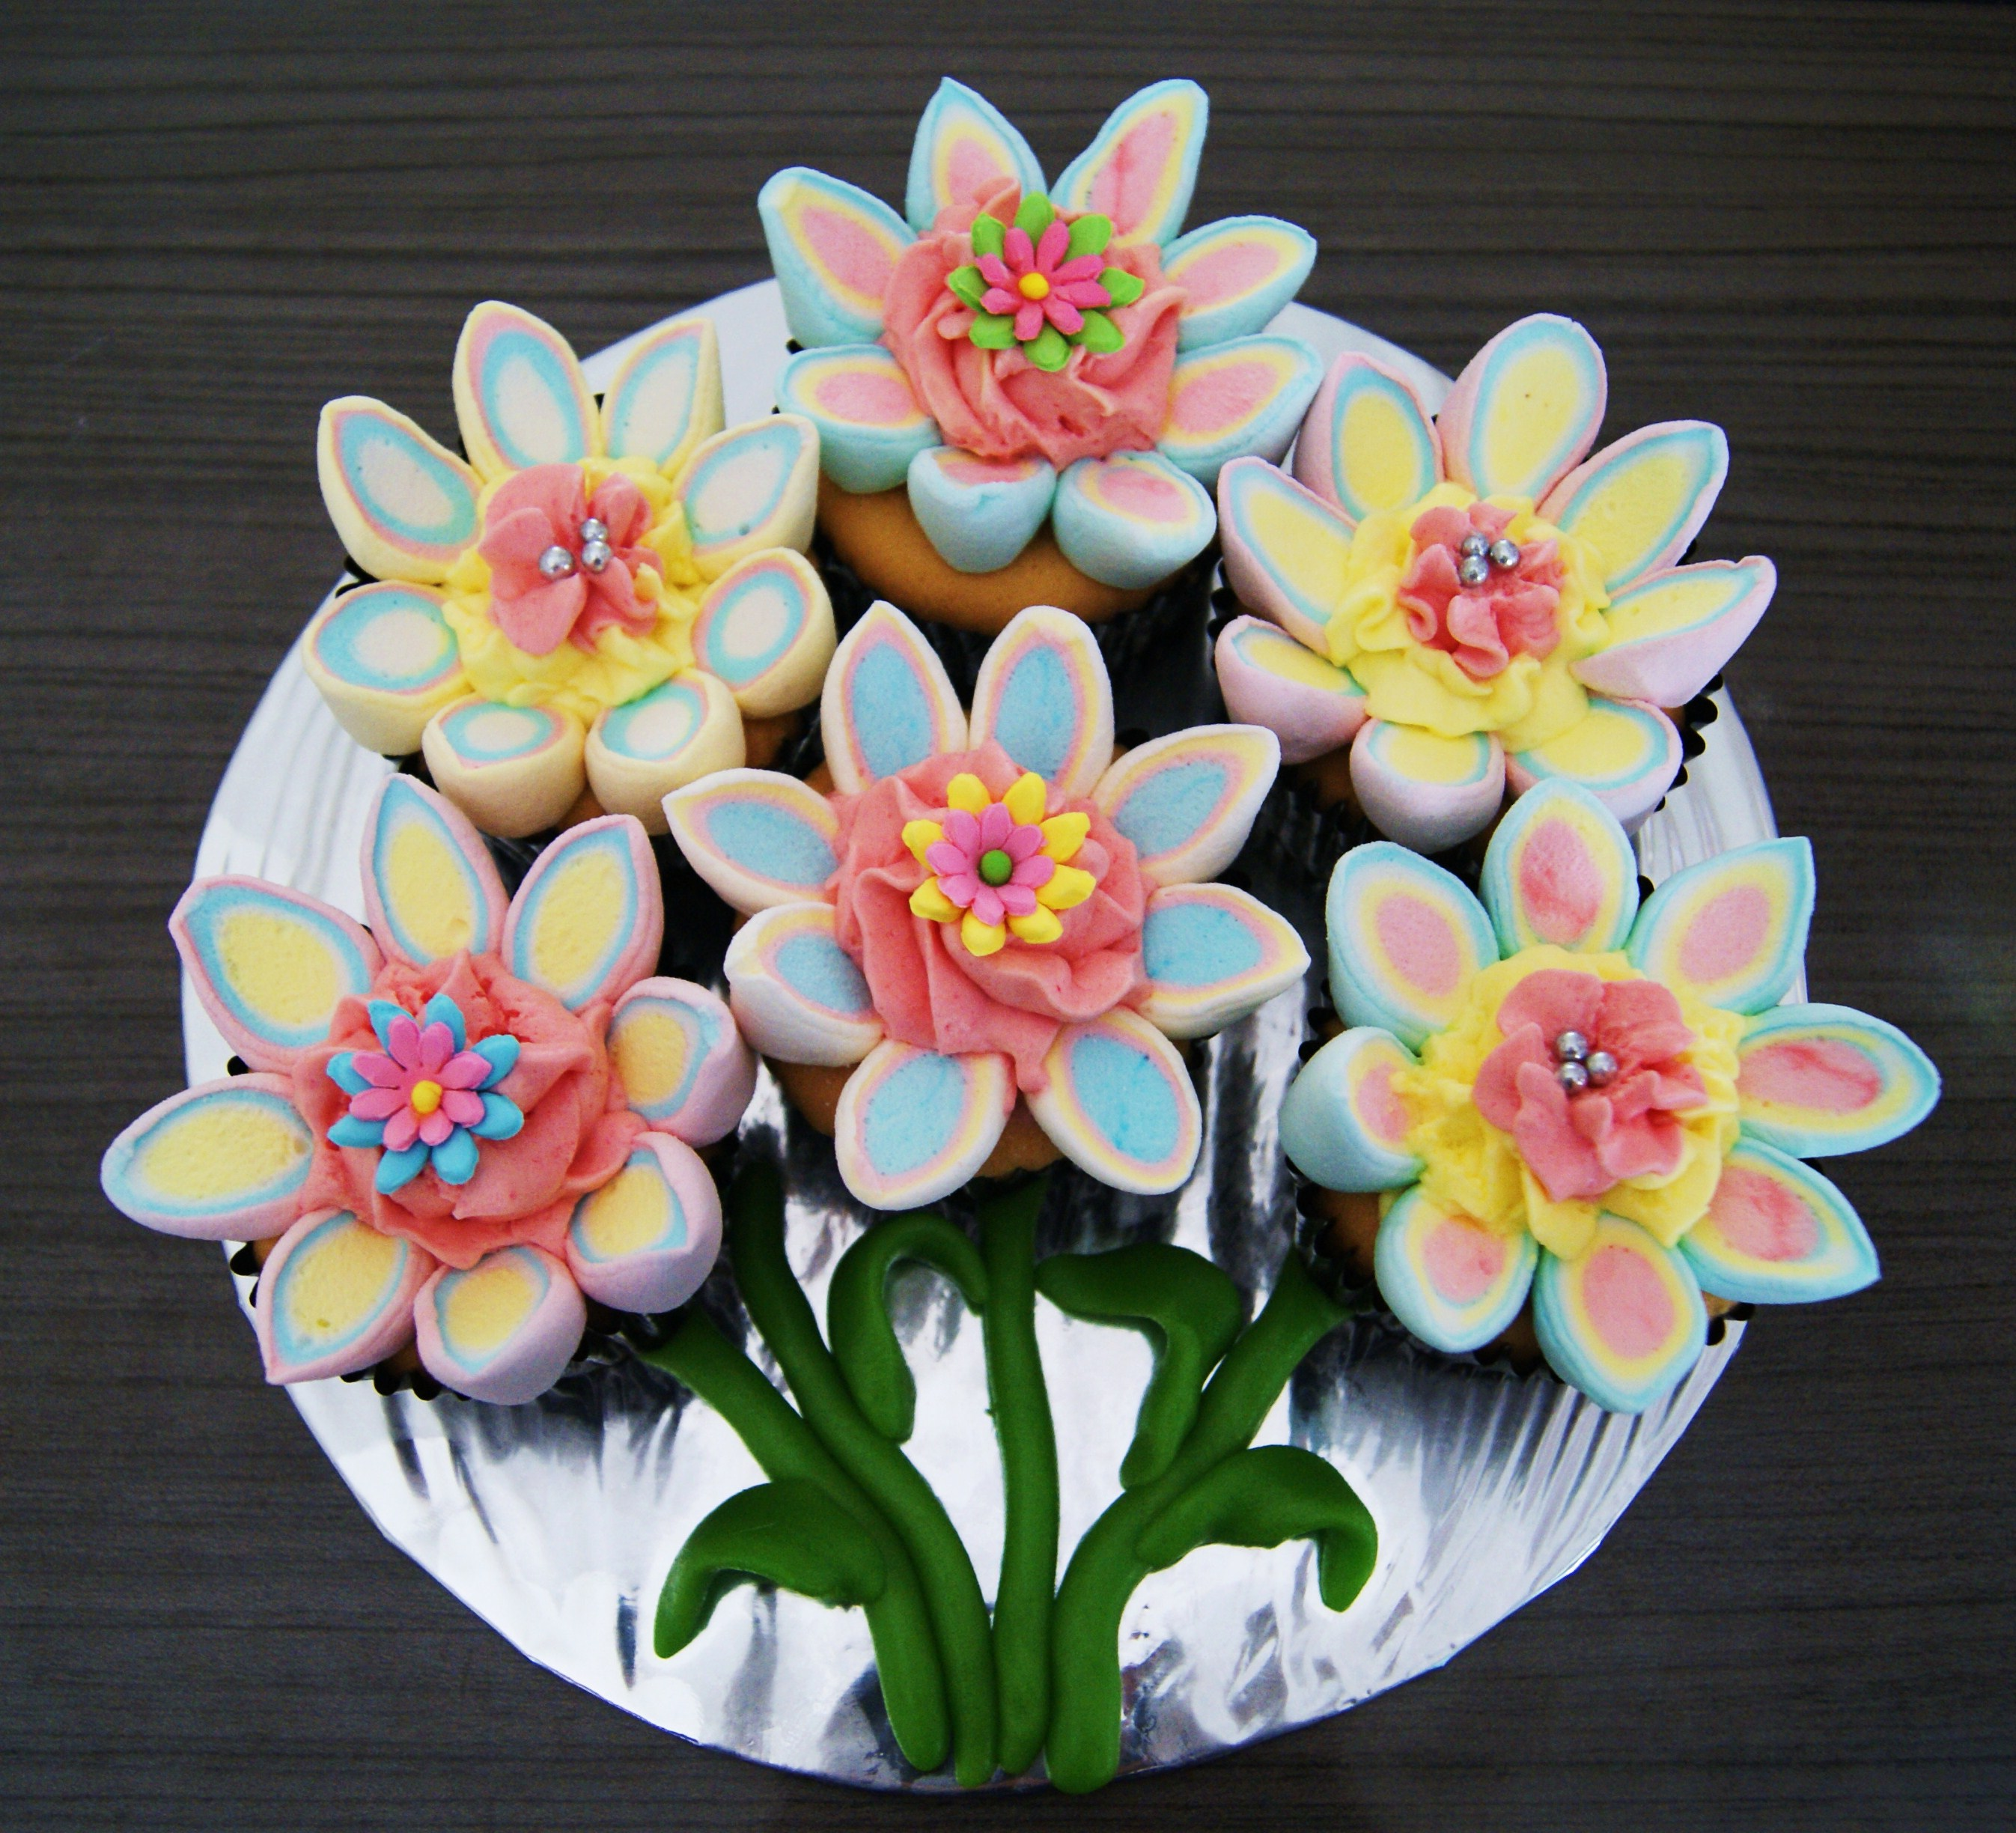 Happy Mothers Day Sony Dsc